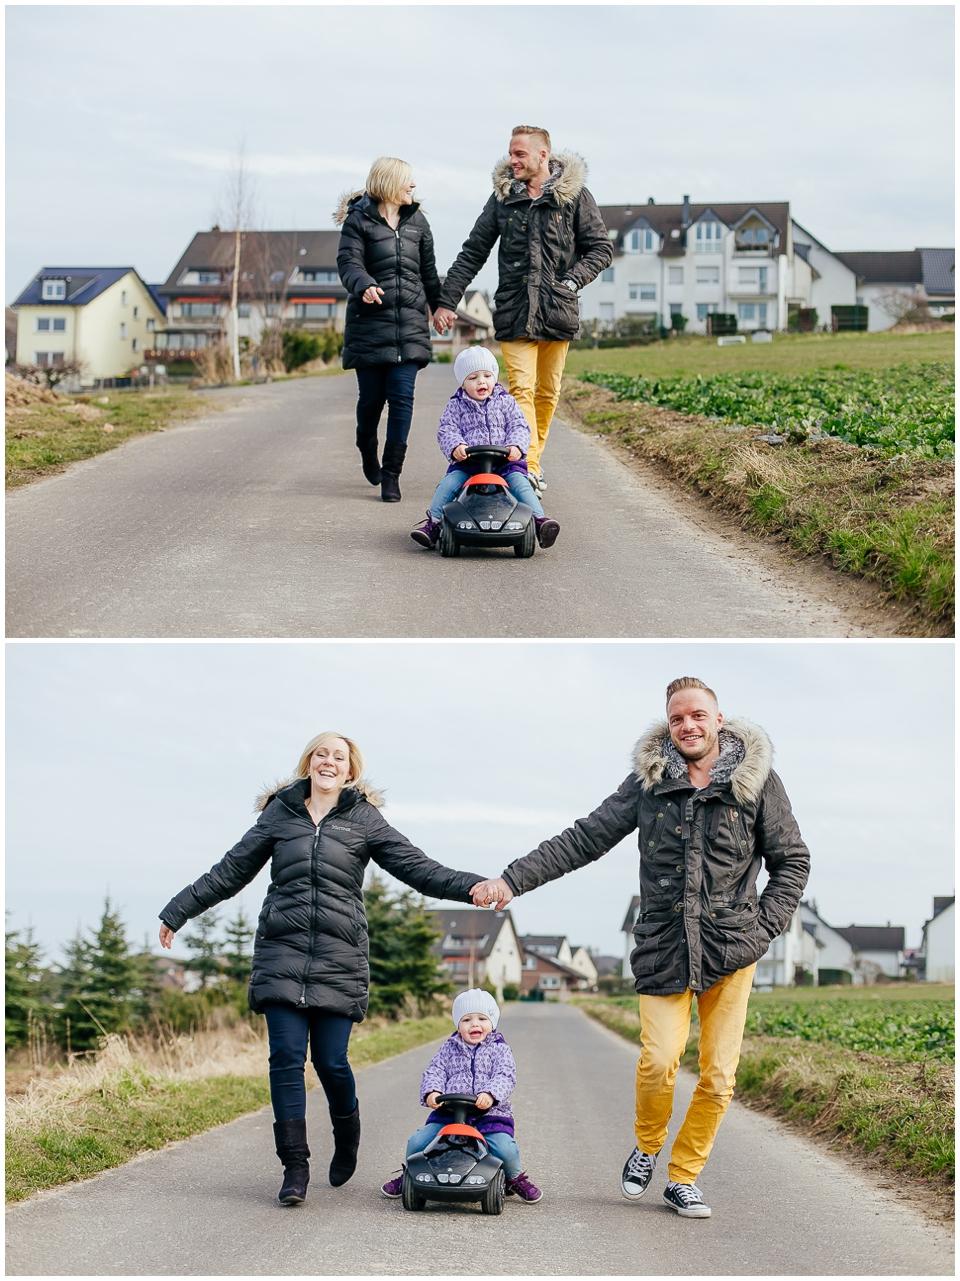 Familienshooting JB - Nicole Wahl Fotografie - Bonn_0033